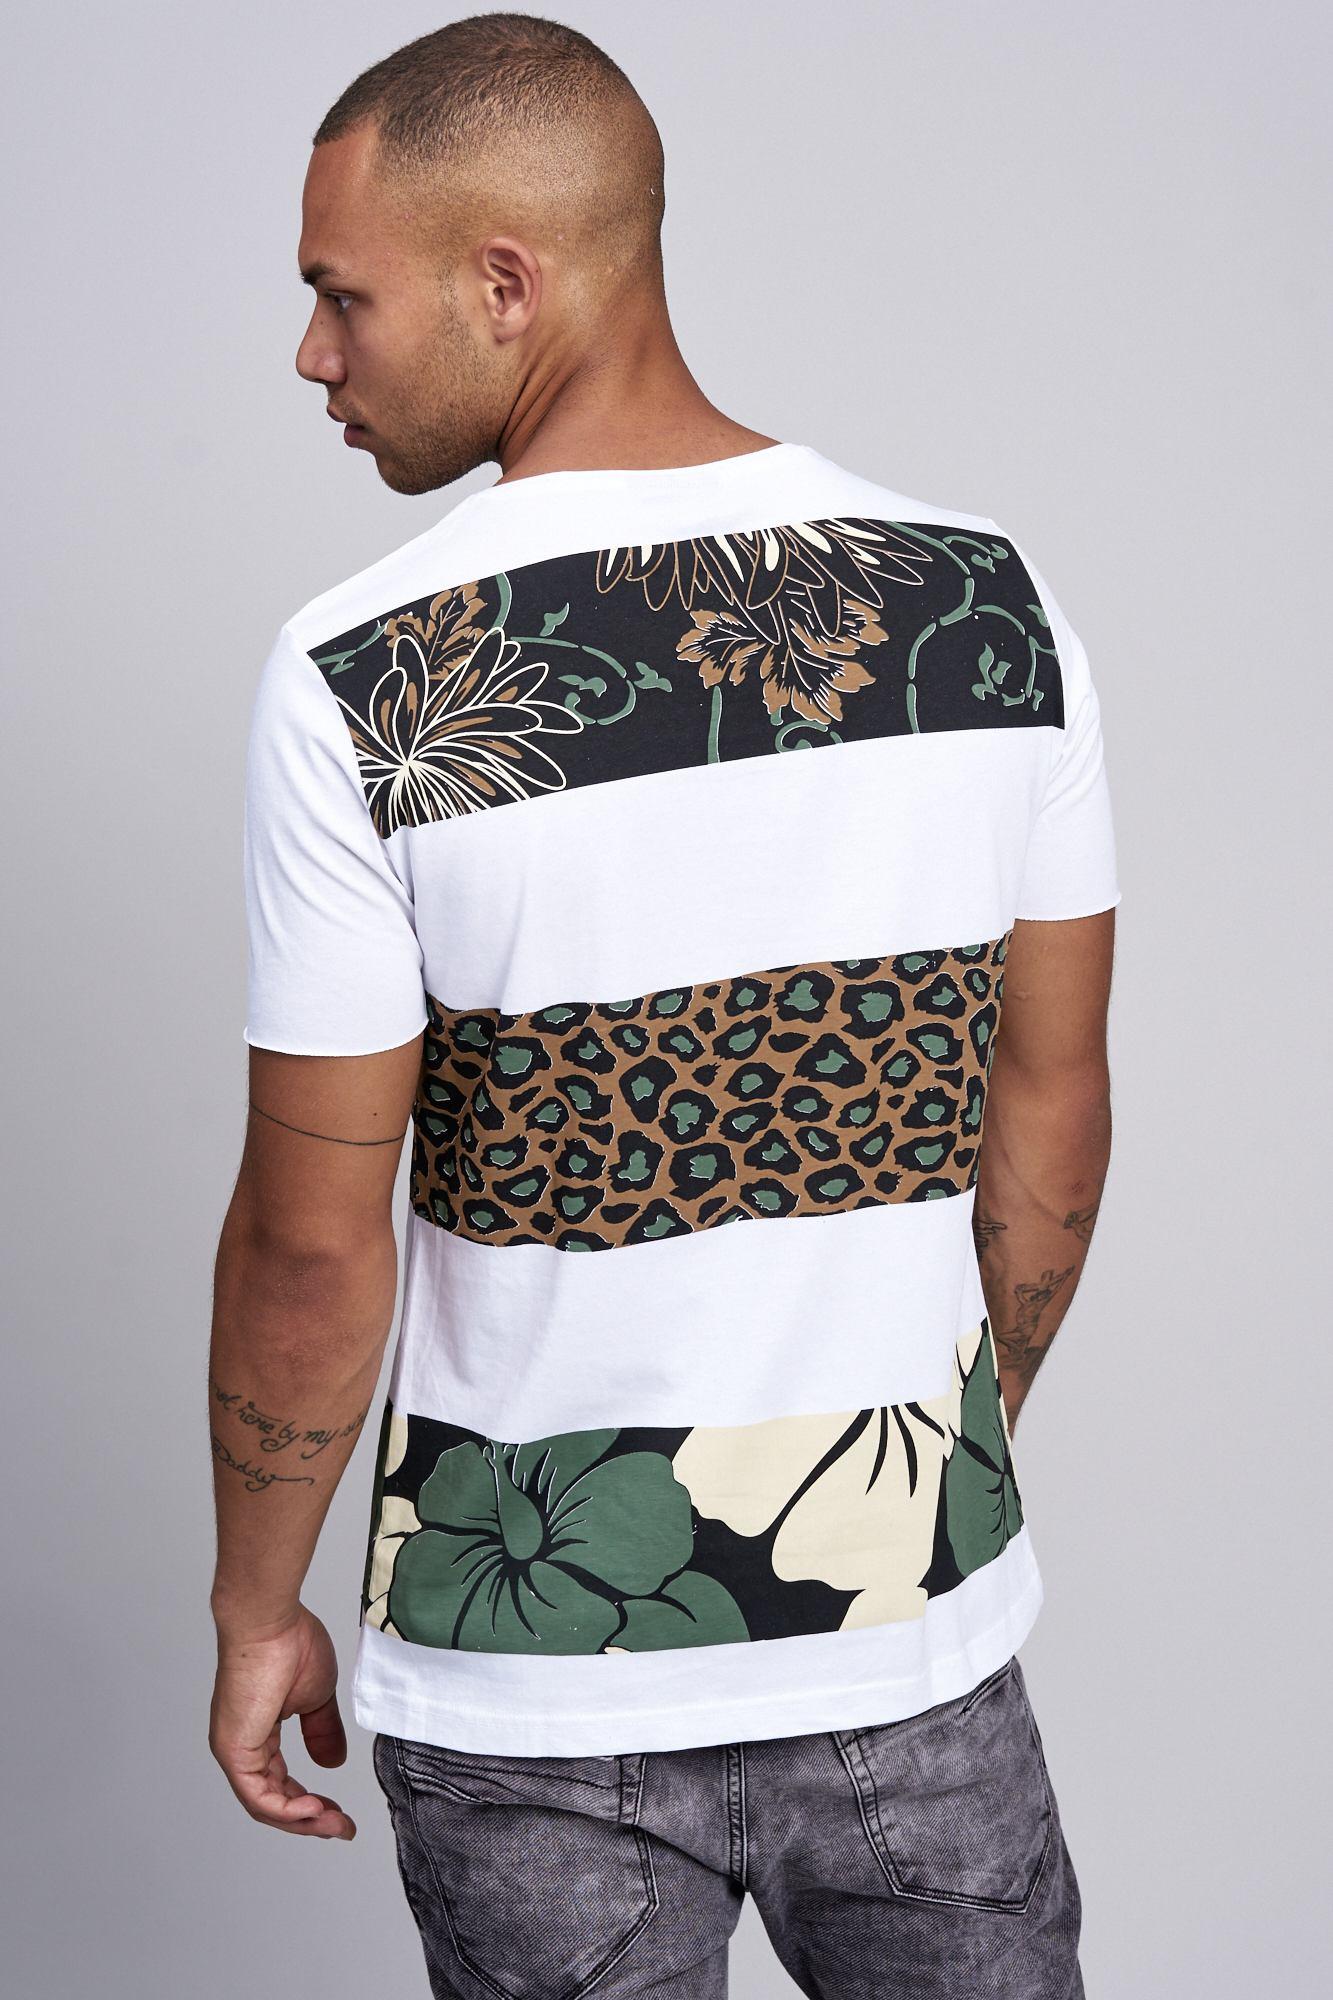 T-shirt-da-Uomo-Polo-Shirt-a-Maniche-Corte-printshirt-Polo-a-Maniche-Corte-17019-John-Kayna miniatura 29